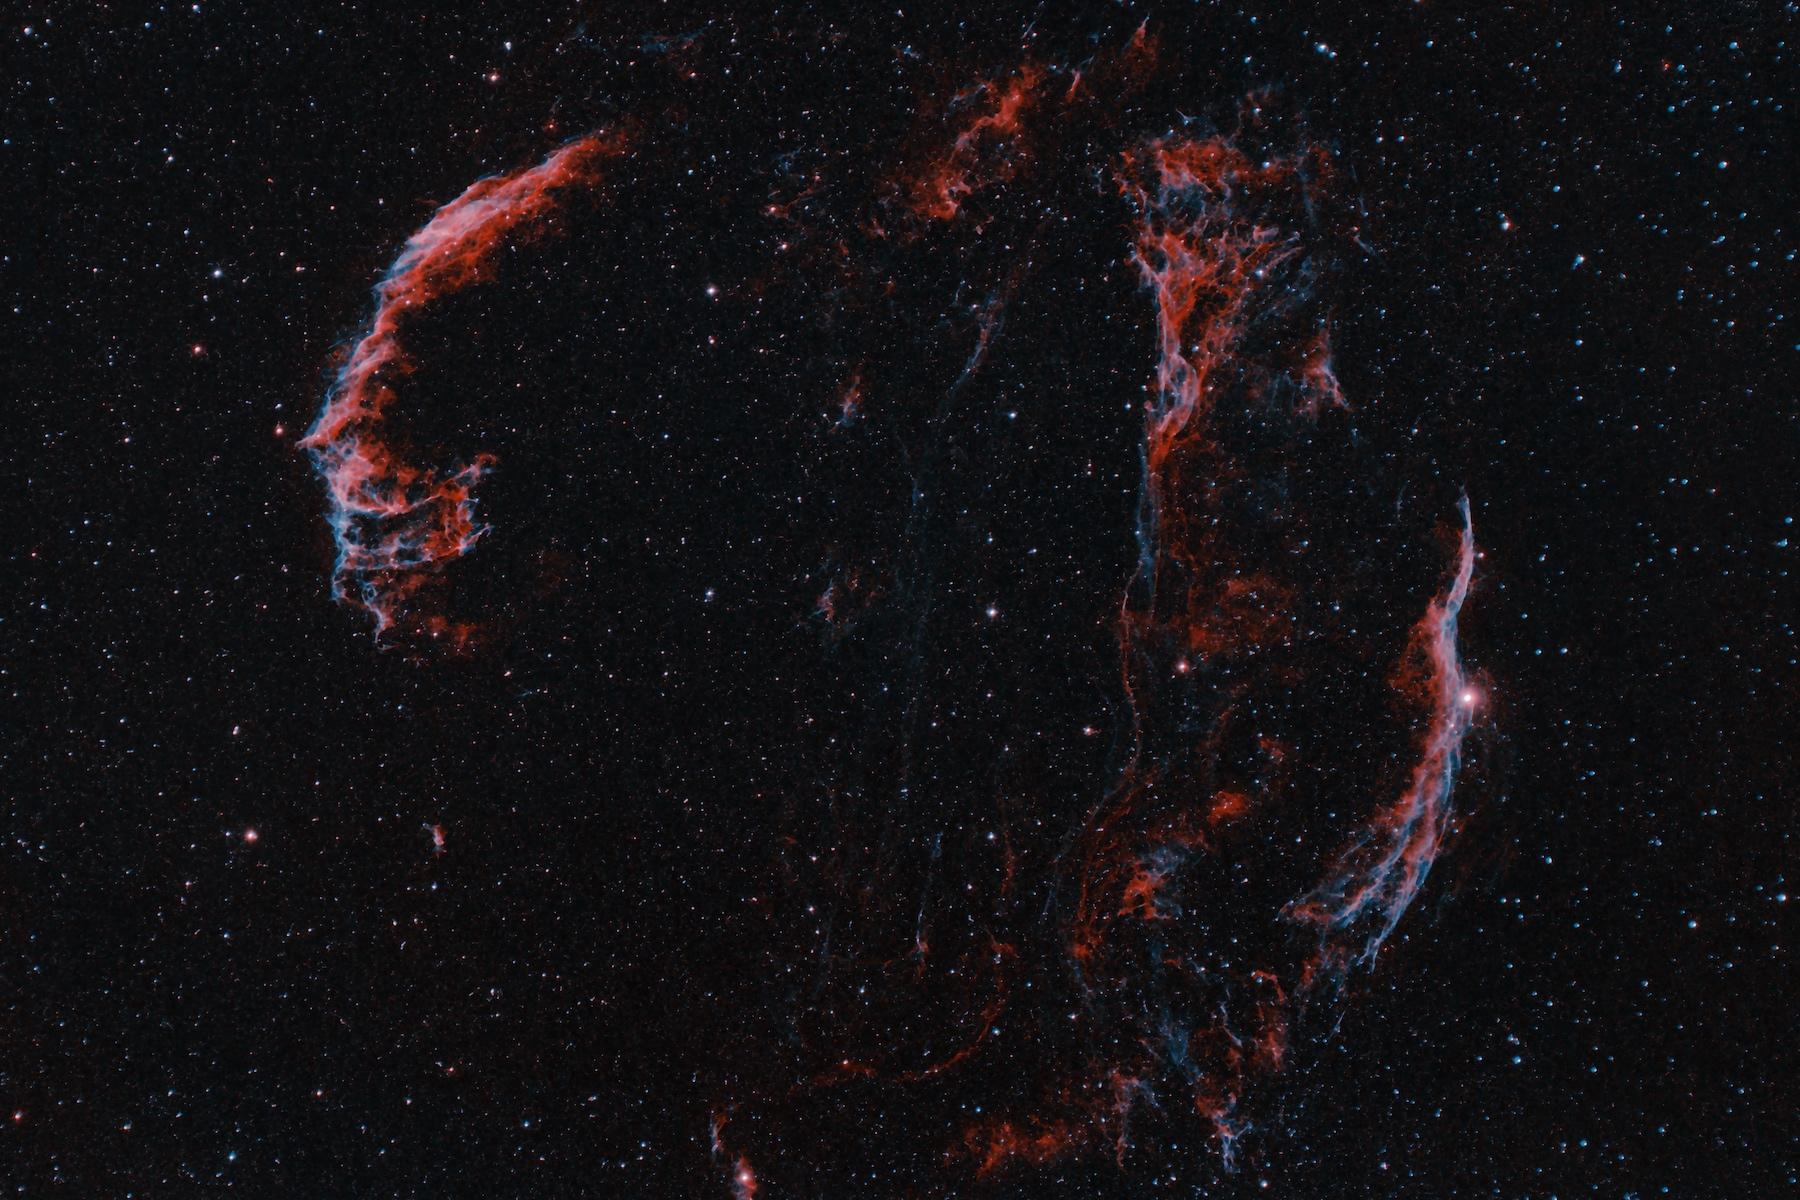 [Bild: Cirrus-Sonnar200-x-1800x1200-Kopie.jpg]